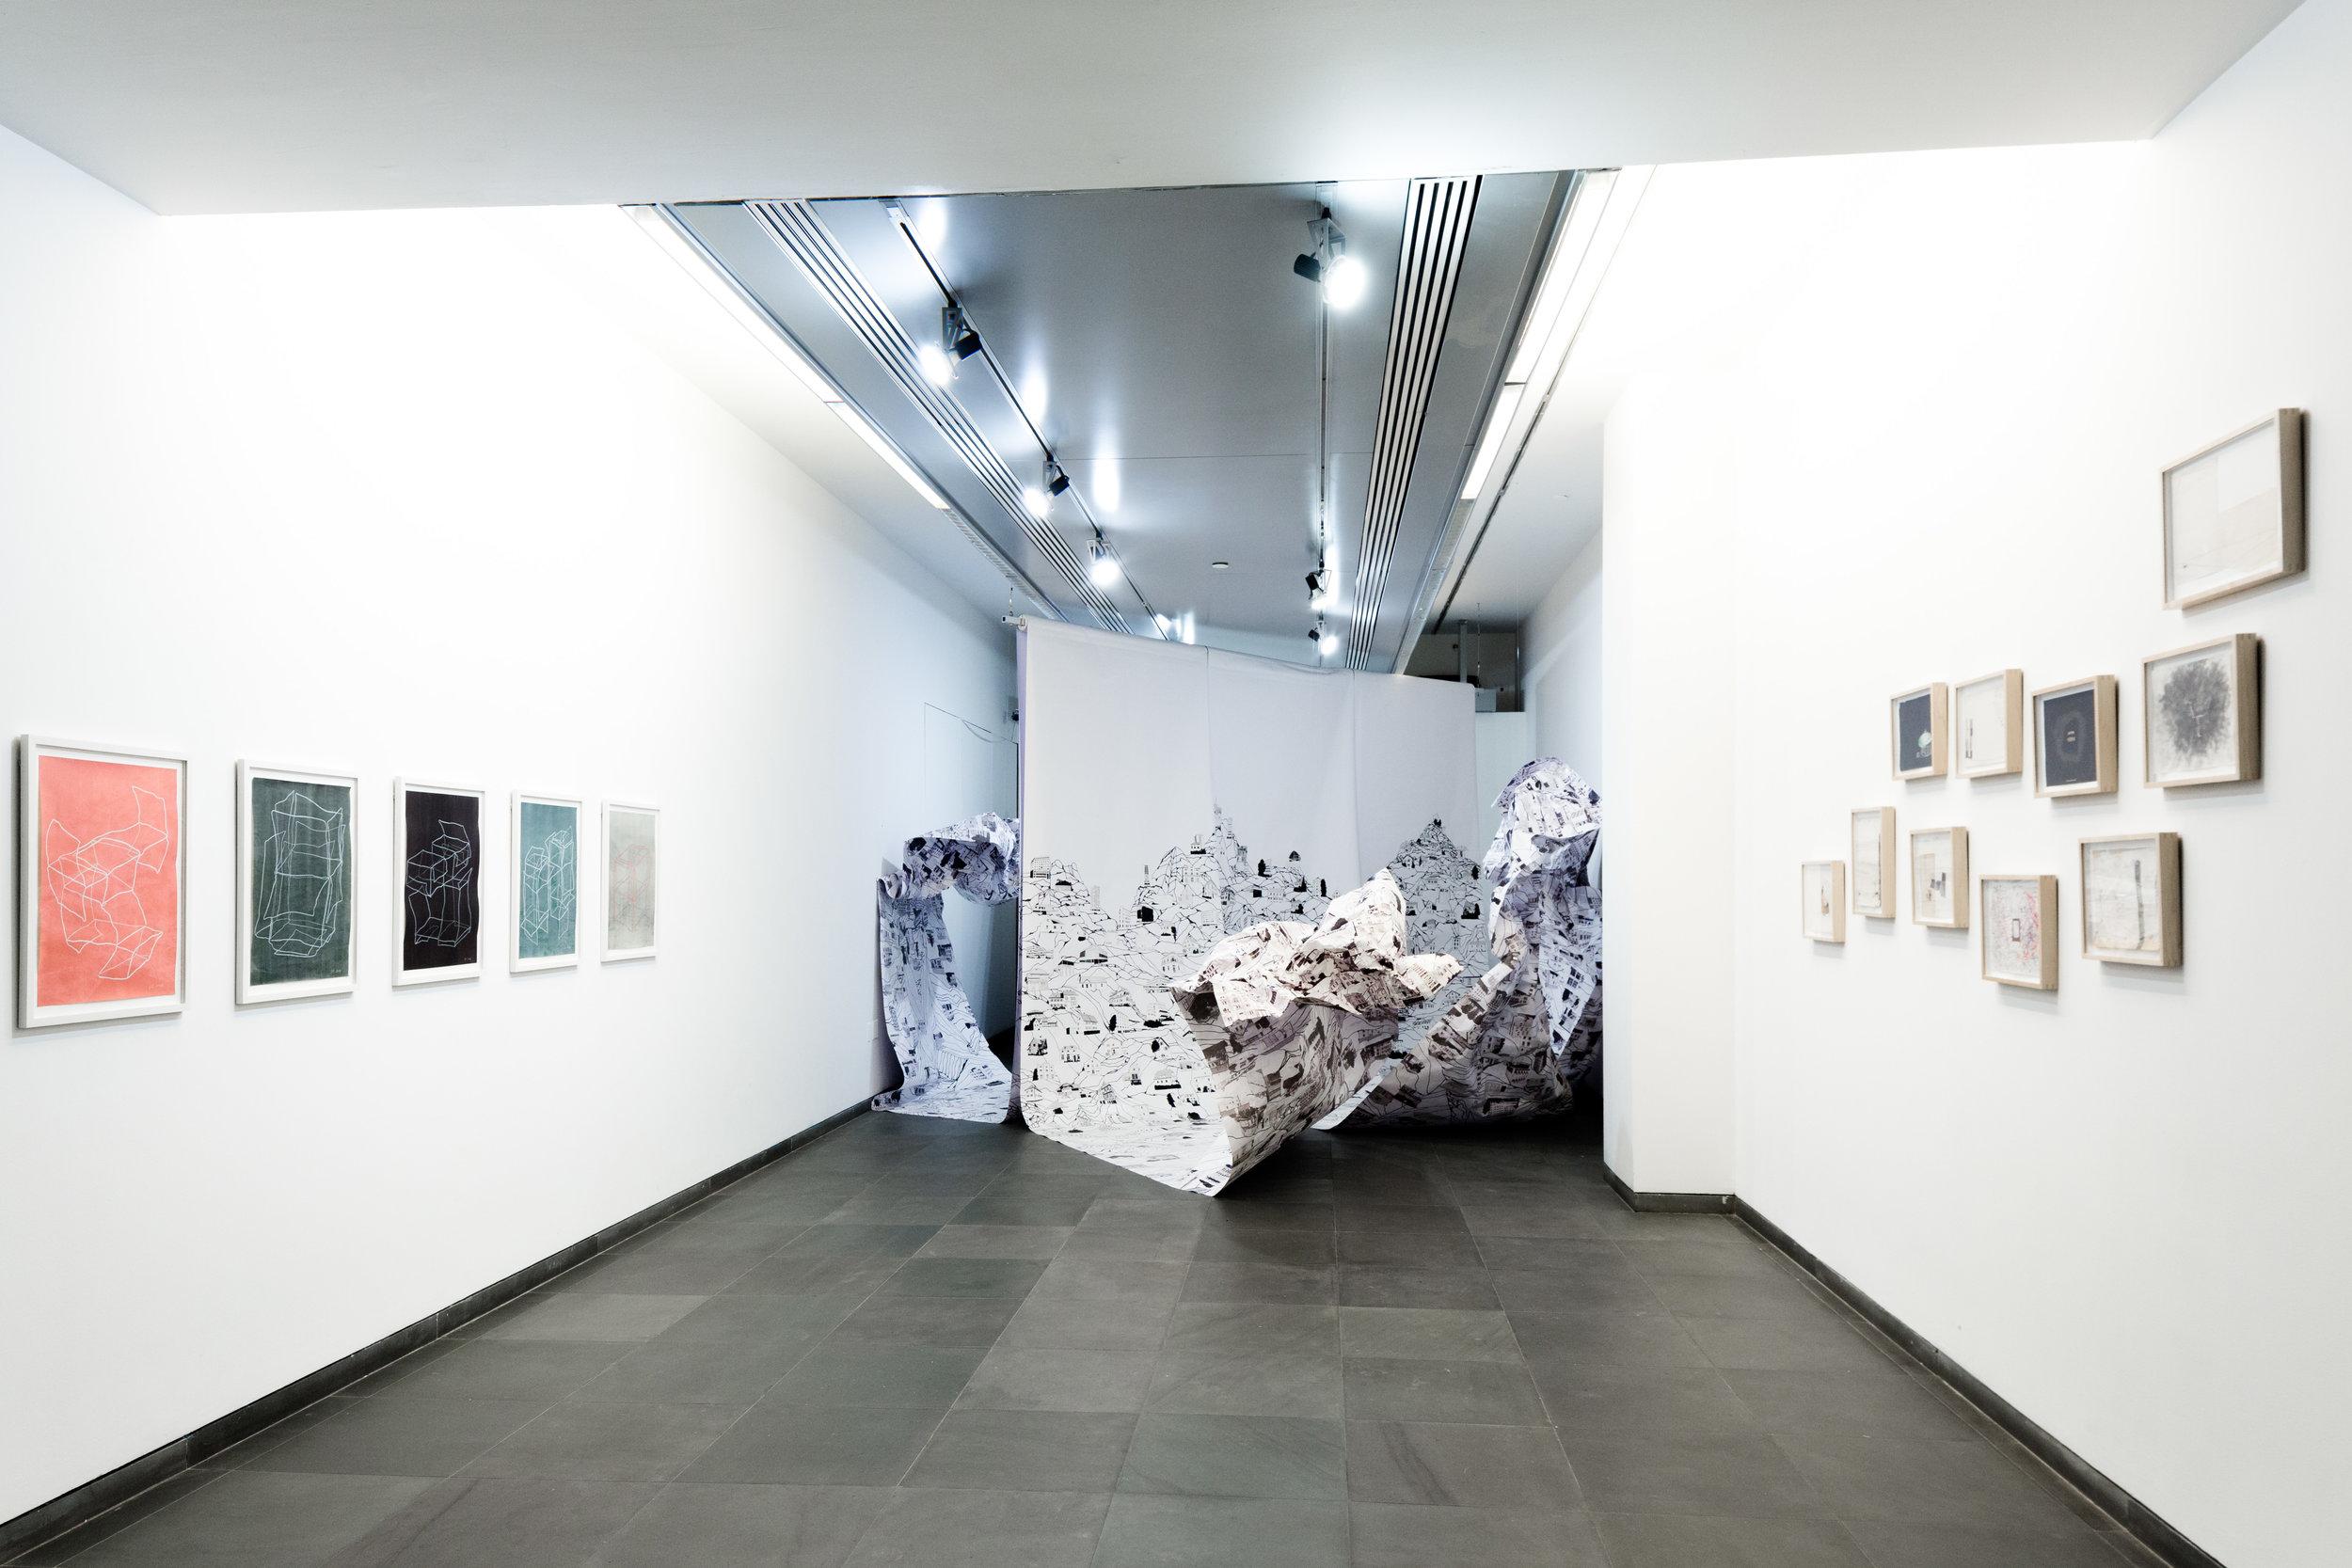 Installation view of works by Brigitte Mahlknecht (left), Judith Saupper (center), William Cordova (right). Image Courtesy ACFNY/Luca Mercedes